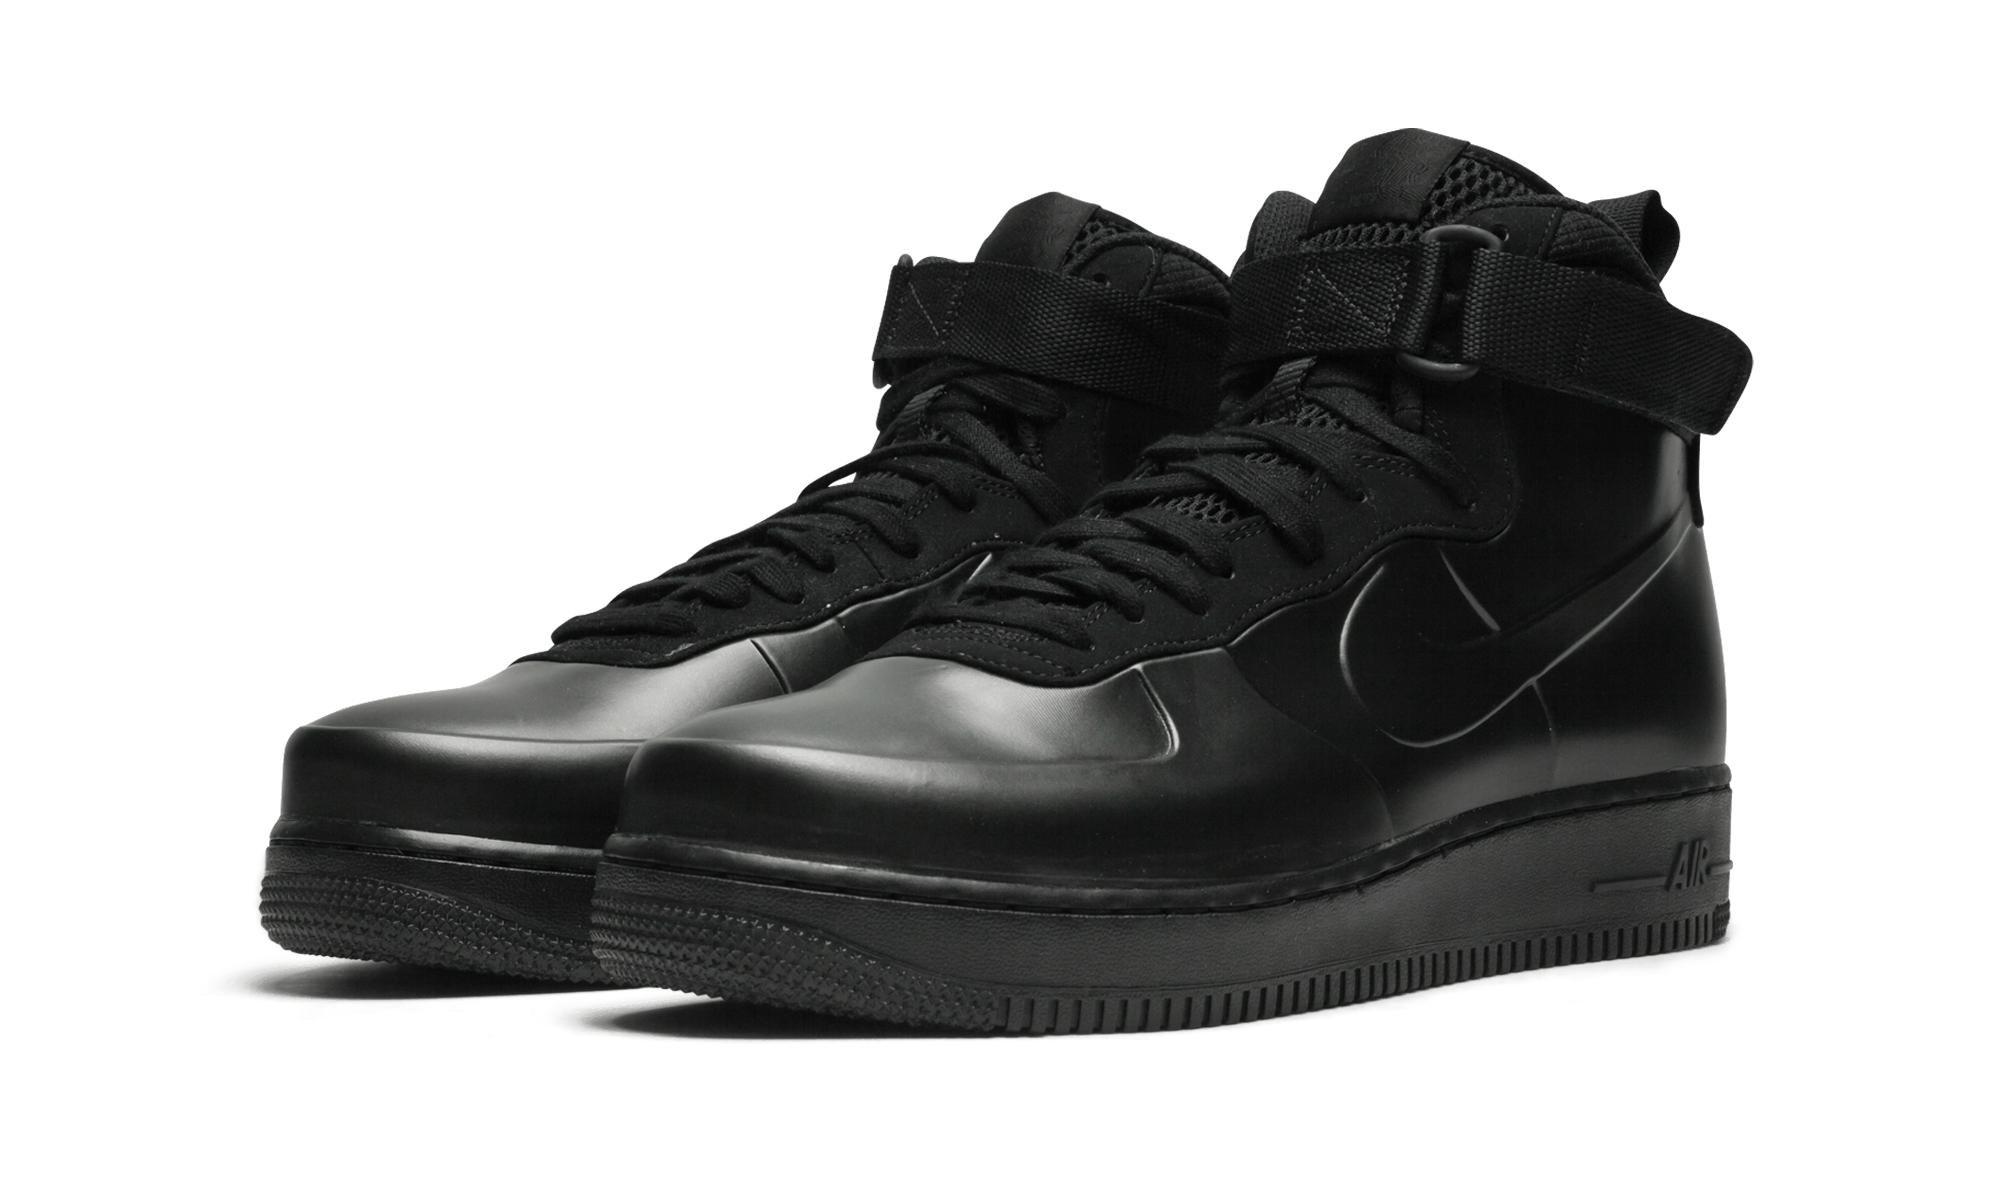 6094e40cd3118 Nike - Black Air Force 1 Foamposite Cup for Men - Lyst. View fullscreen